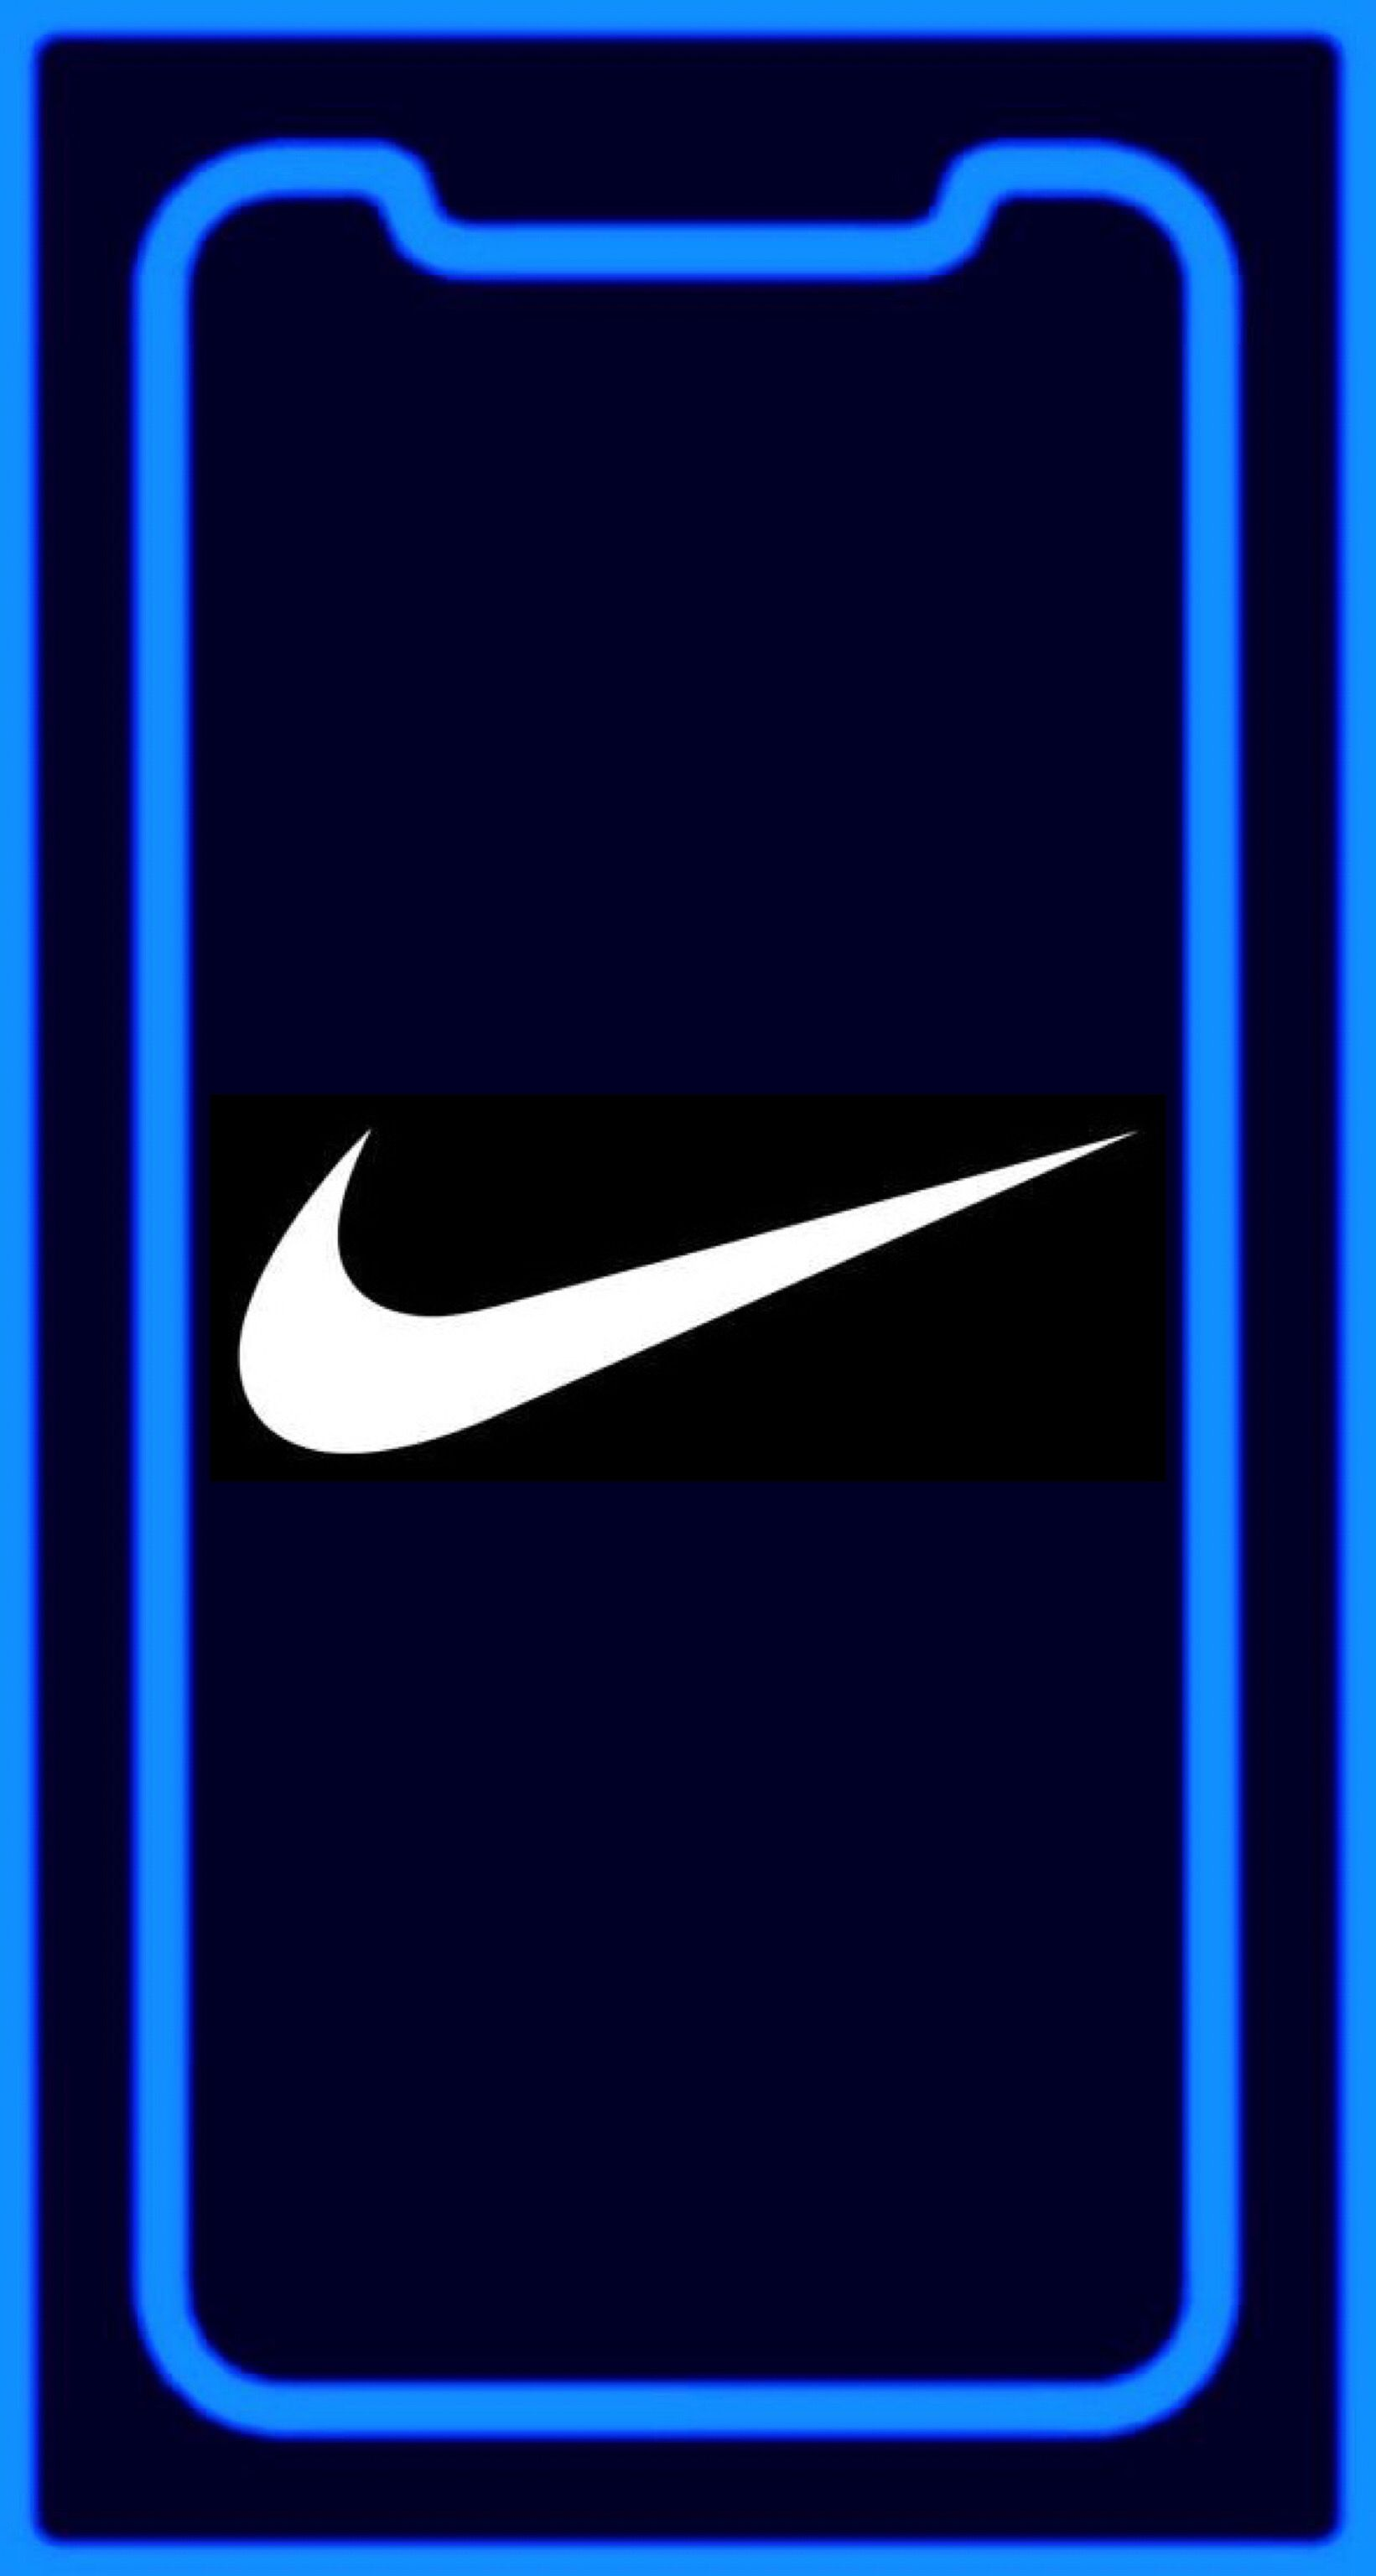 Wallpaper Iphone X Nike White Screensaver Iphone Nike Screensavers Iphone Homescreen Wallpaper